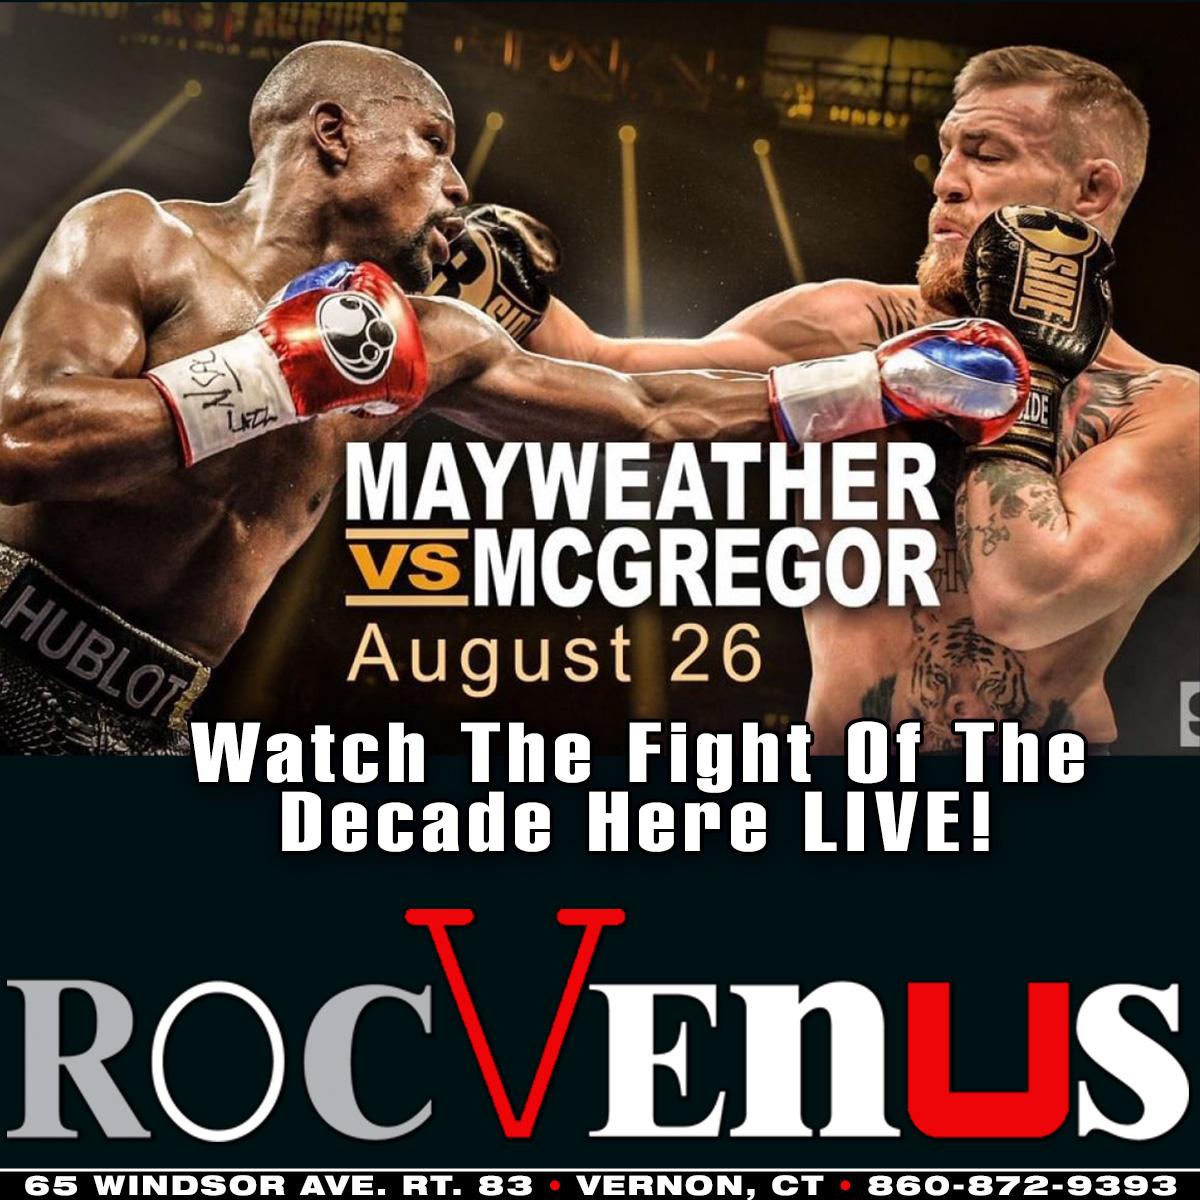 Mayweather Vs McGregor | RocVenus Strip Club Connecticut